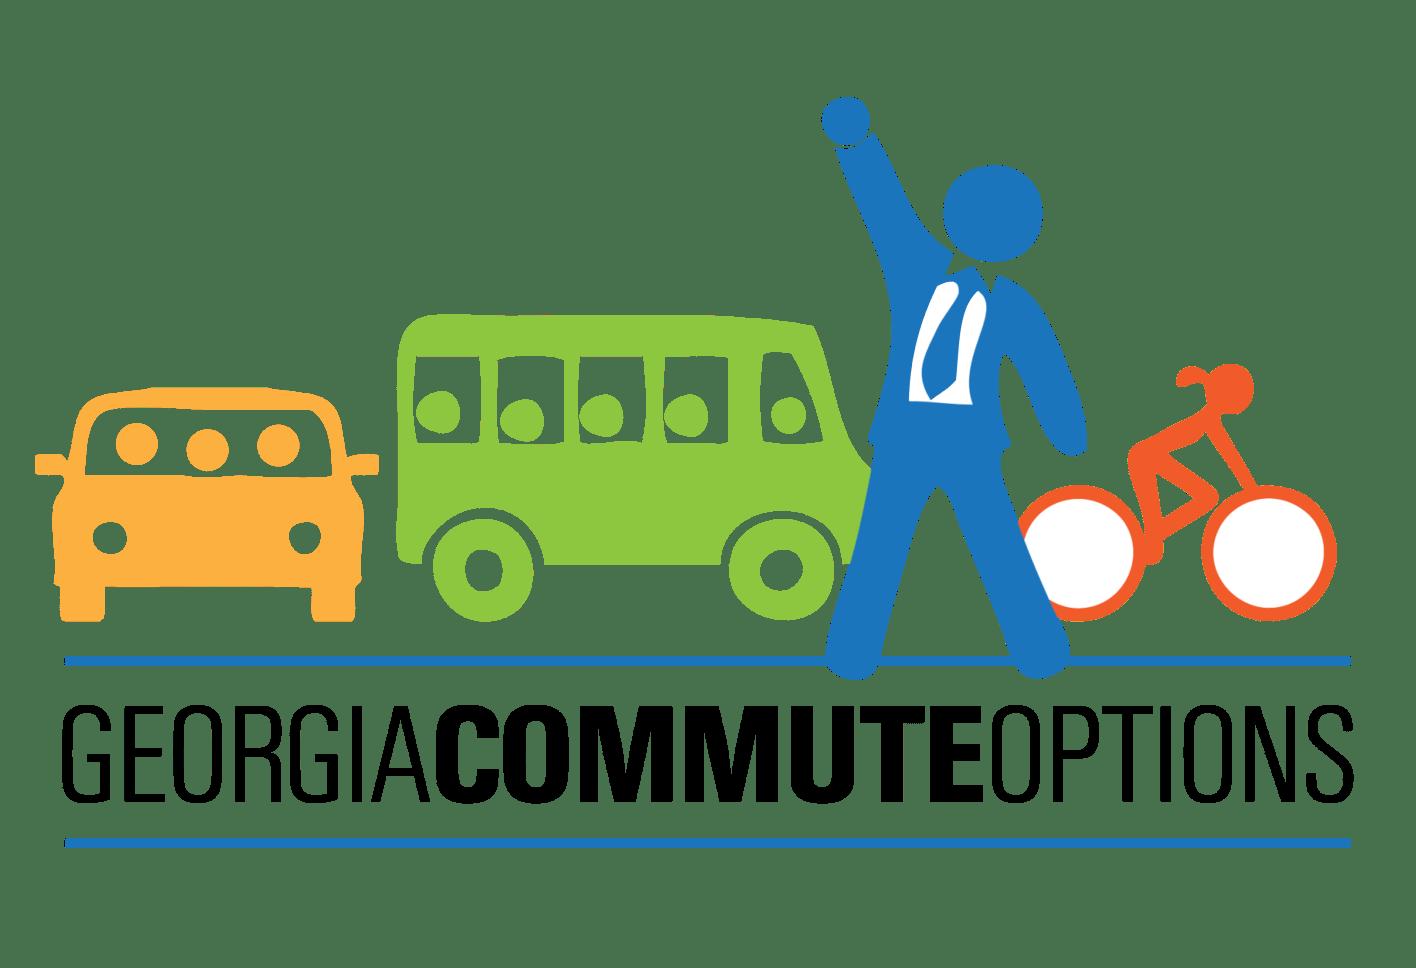 GeorgiaCommuteOptions